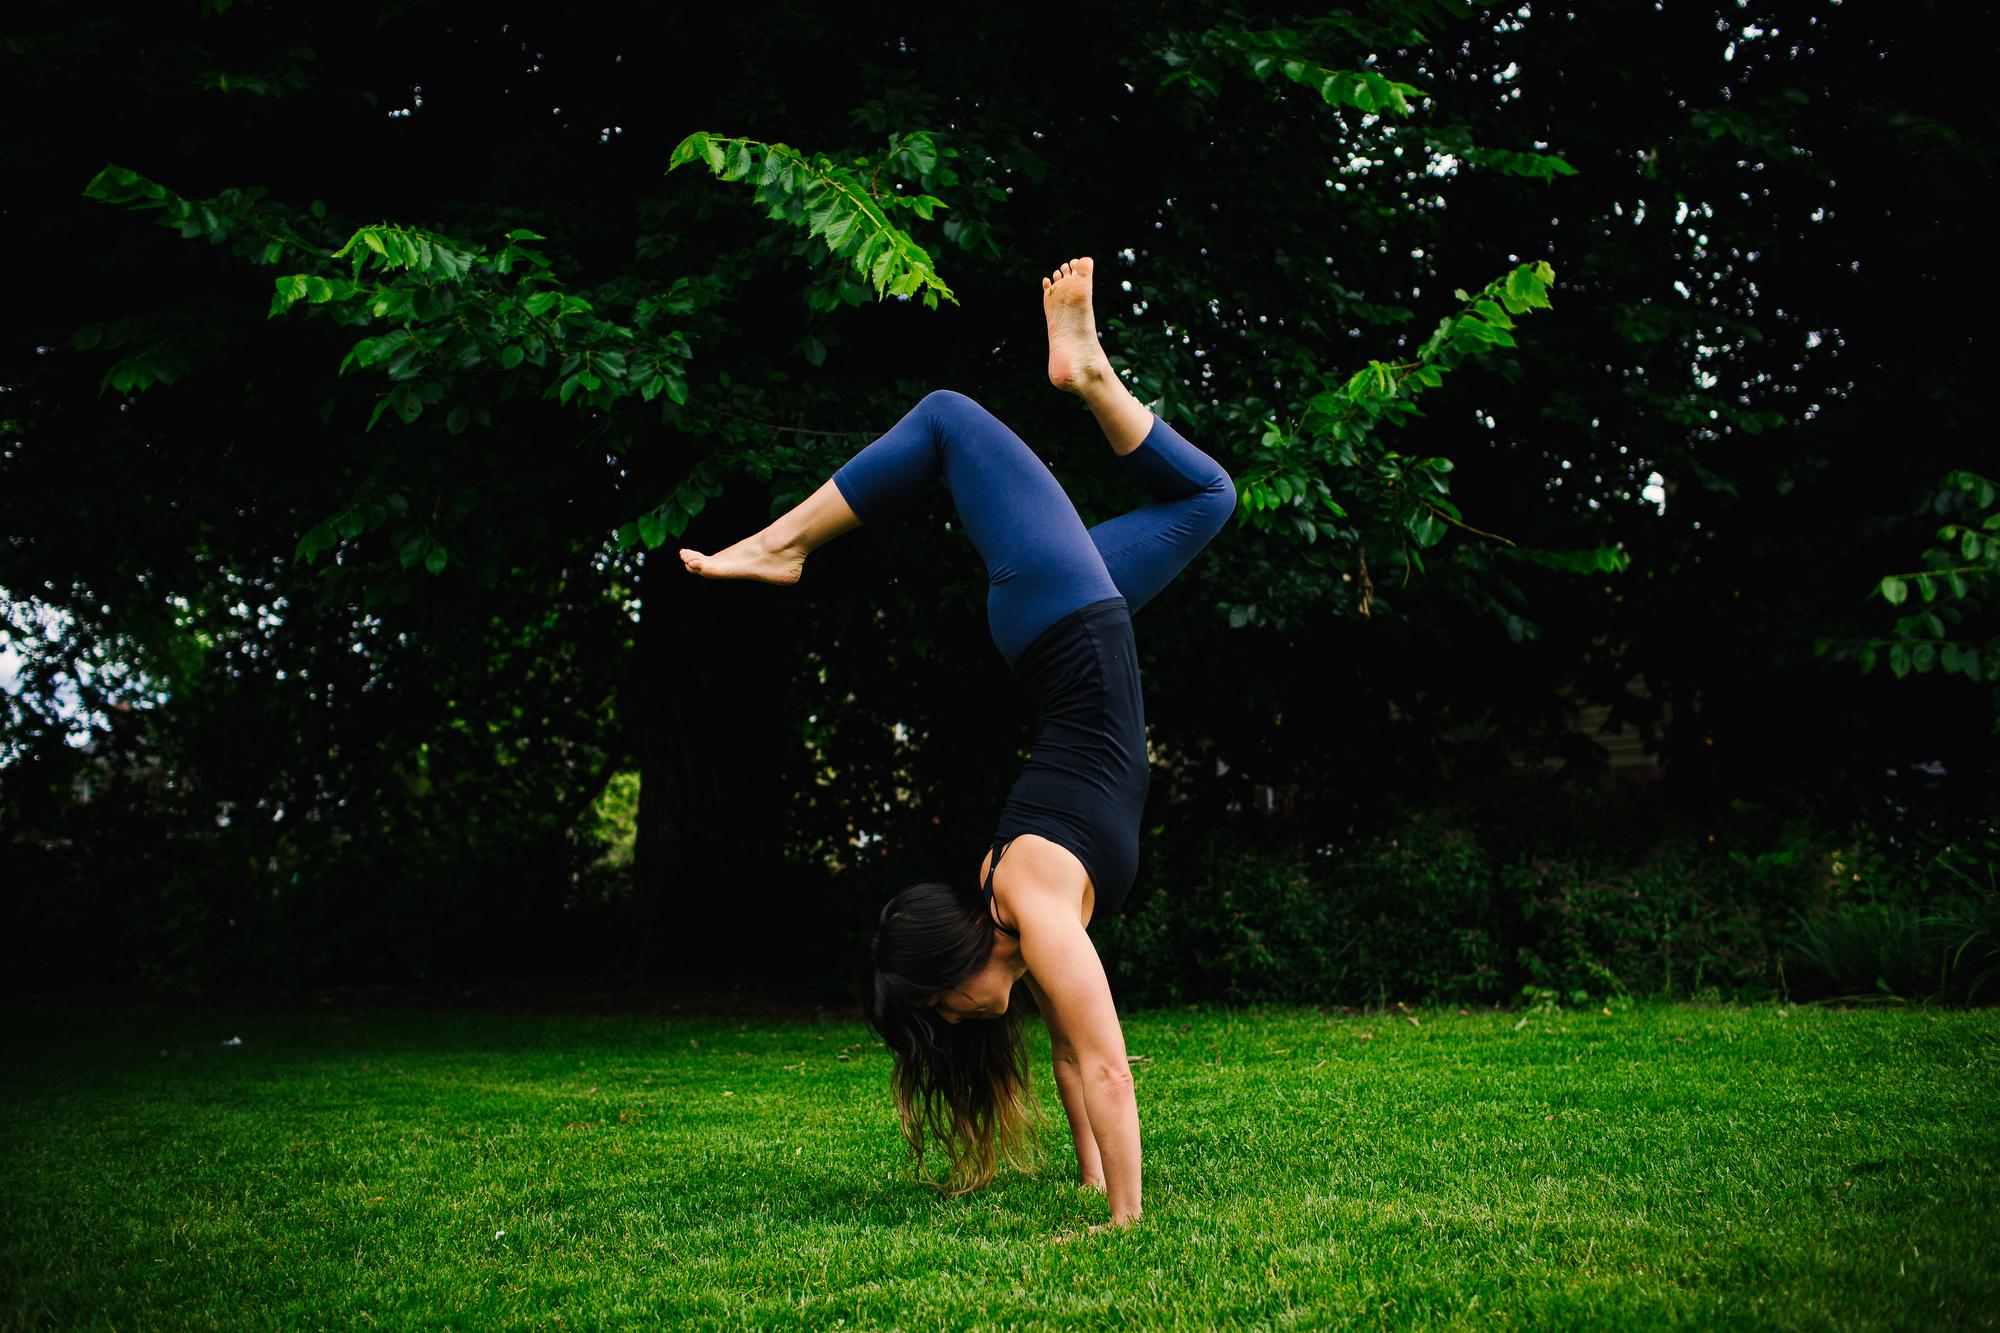 Yoga Medicine Ambassador and Yogi, Danielle. Headshots and lifestyle portraits by Stark Portraits.